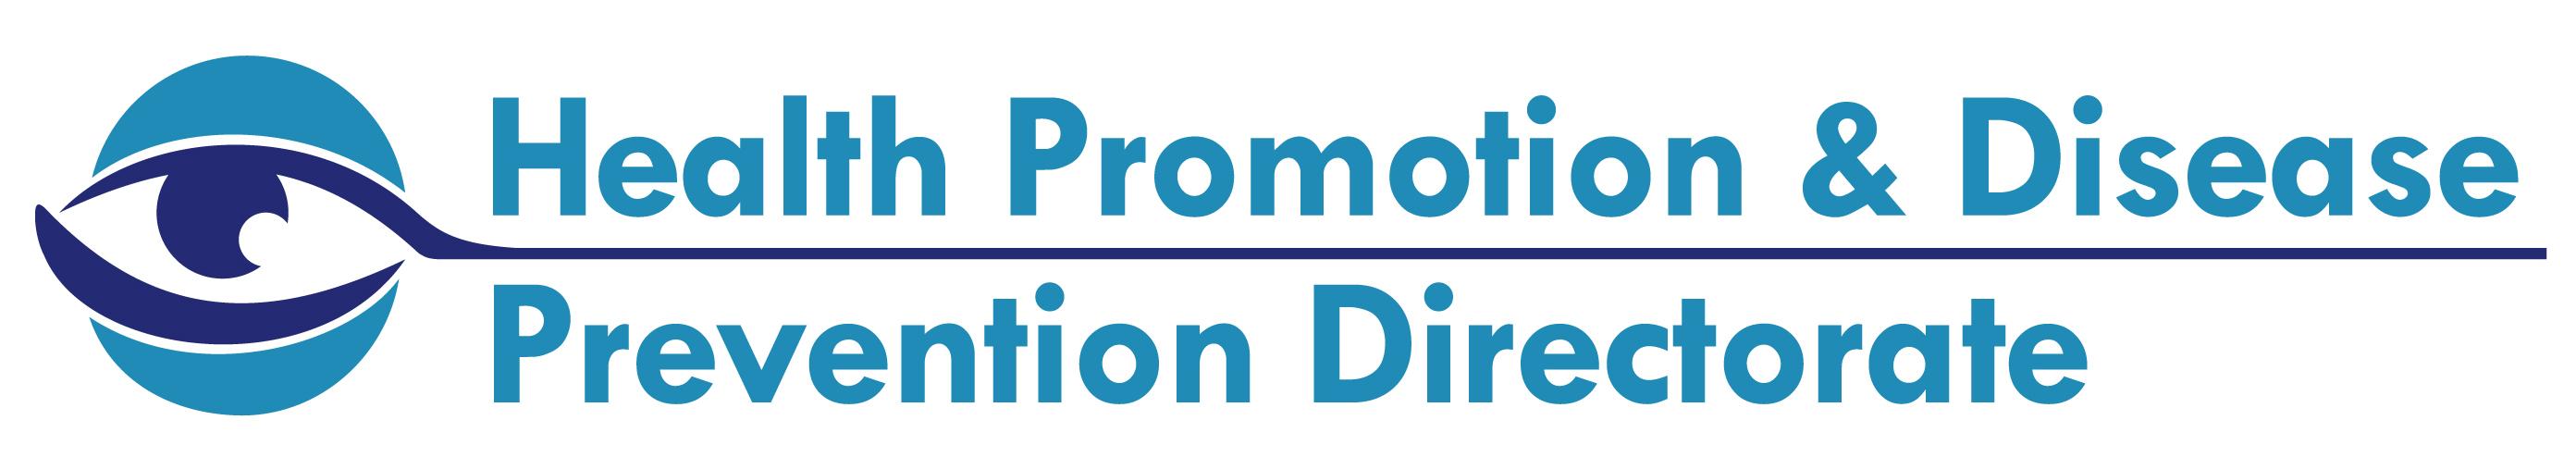 HP&DP logo (Malta)